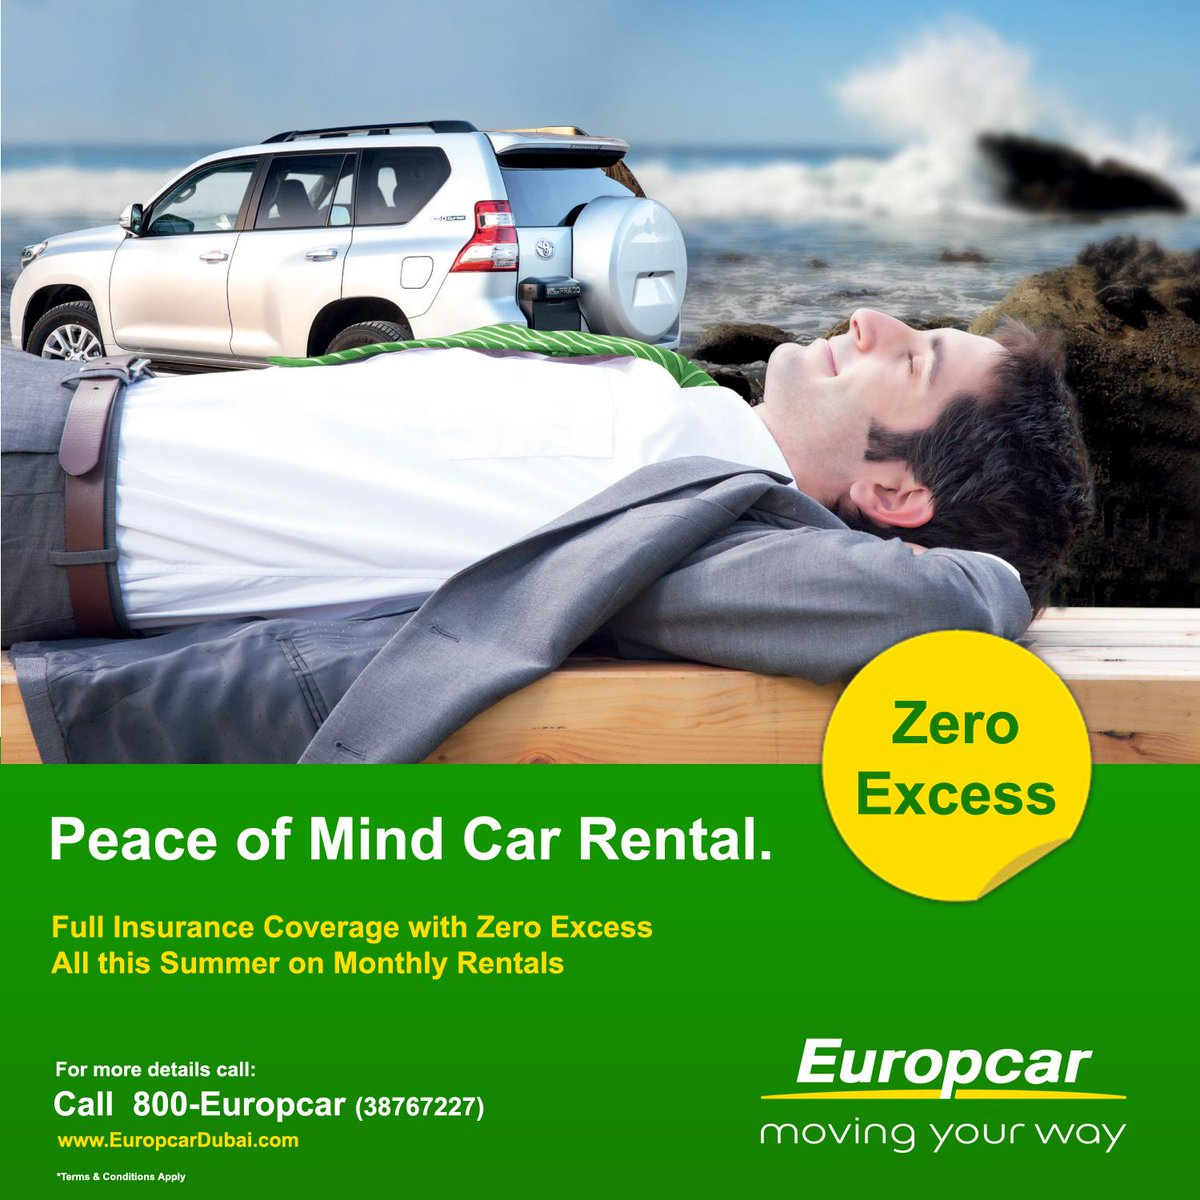 Europcar Dubai On Twitter Europcar Dubai Monthly Carrental